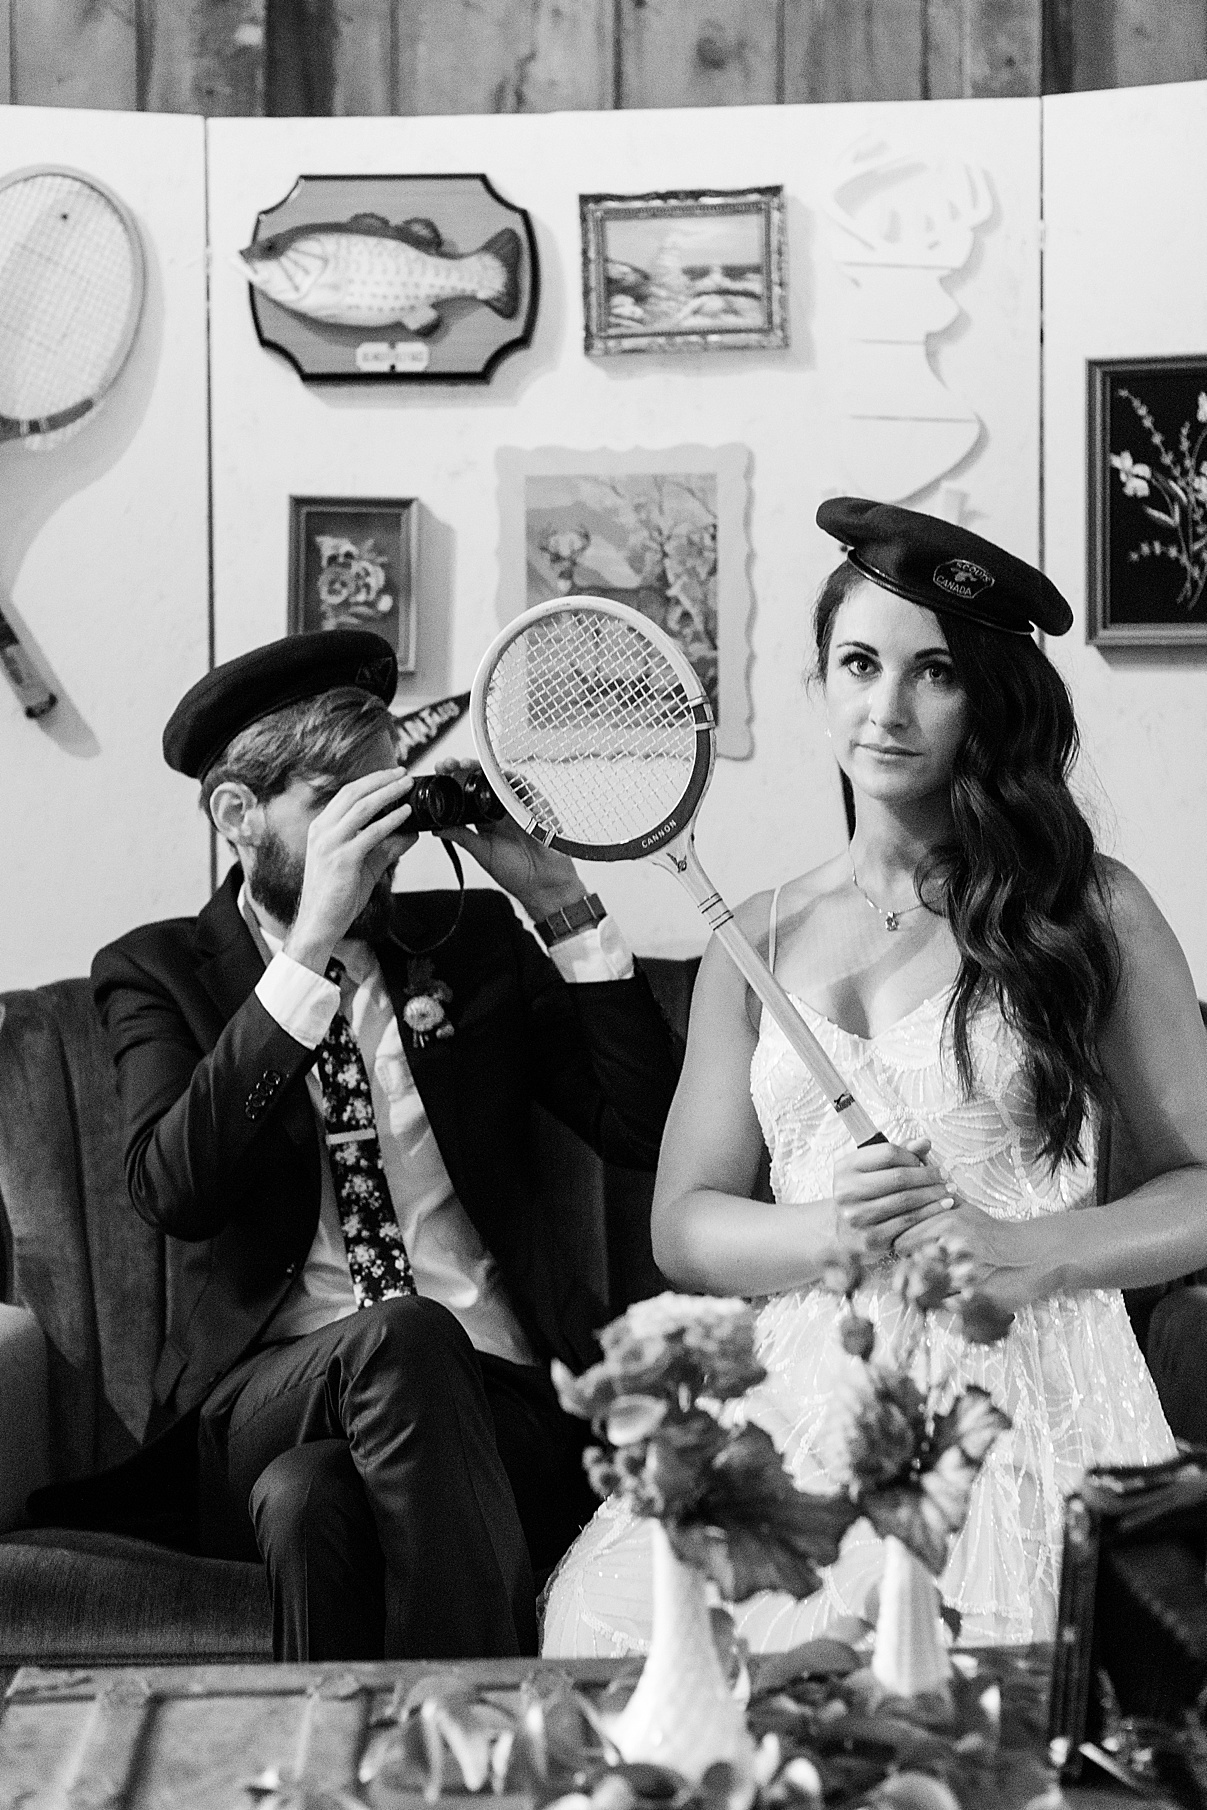 Bride and groom play dress up ink props | Balls Falls, Ontario Wedding| Ontario Wedding Photographer| Toronto Wedding Photographer| 3Photography| 3photography.ca